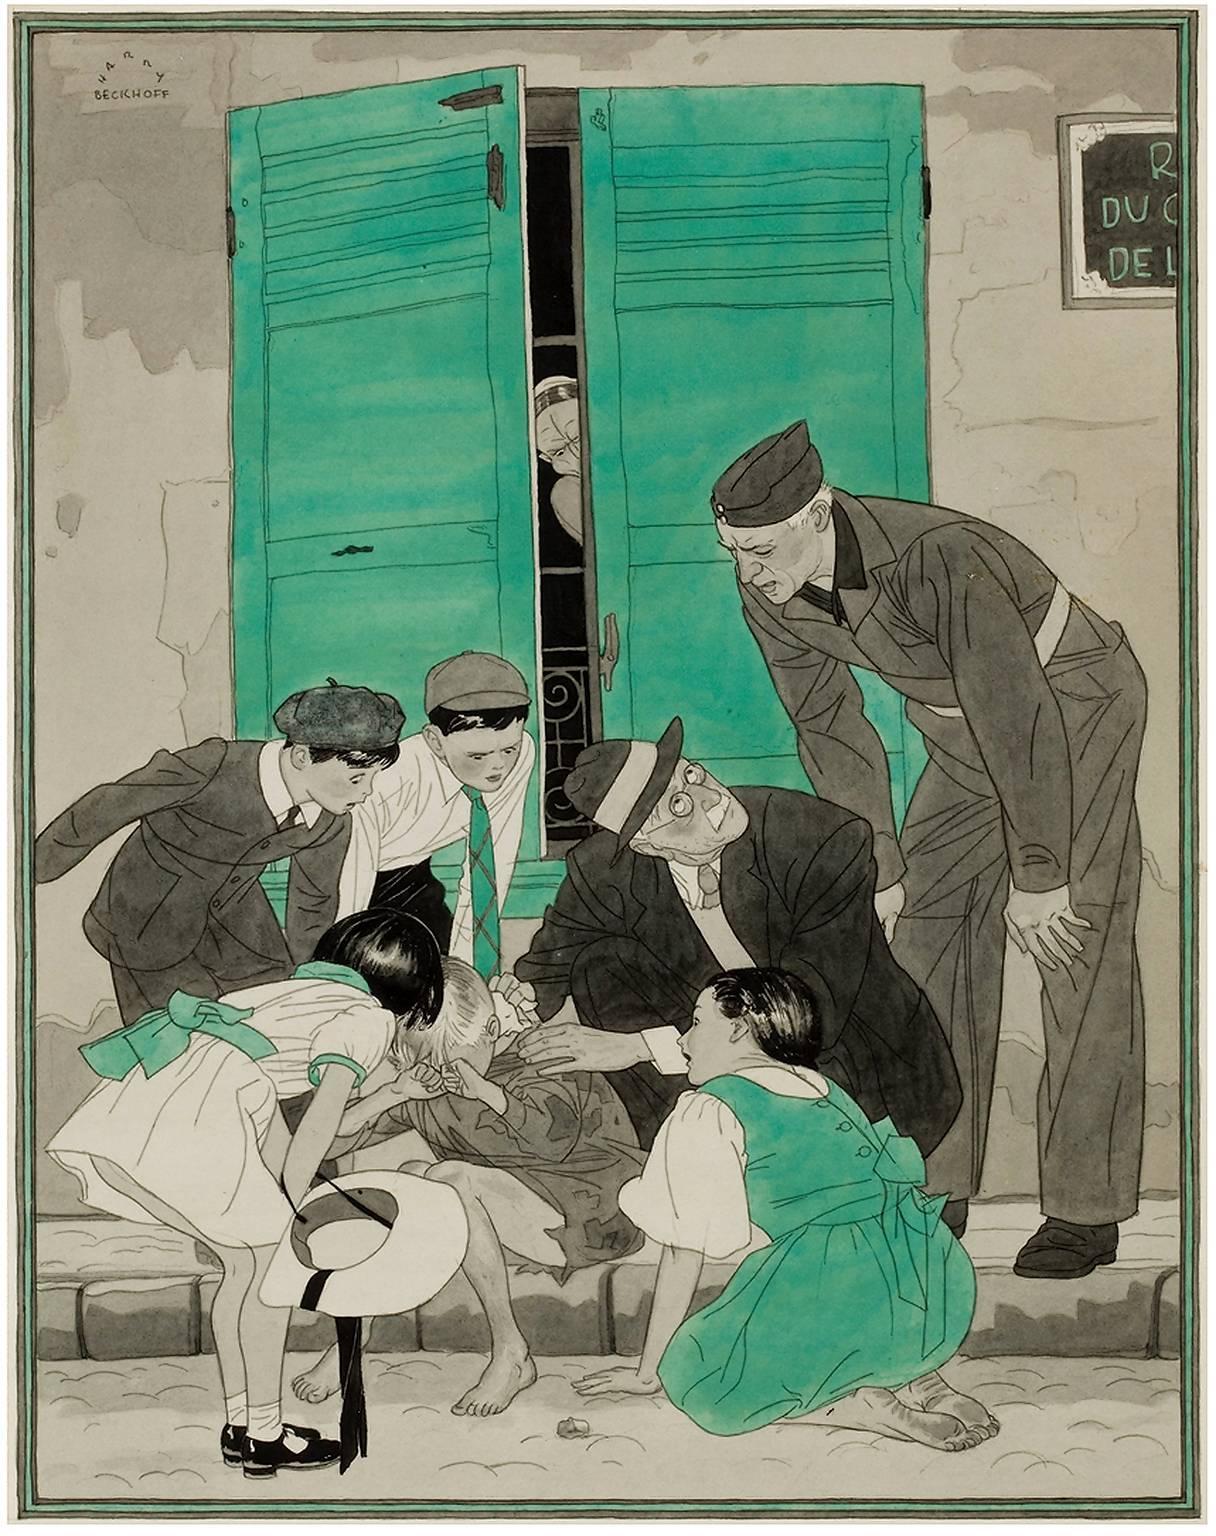 Consolation, Collier's magazine illustration